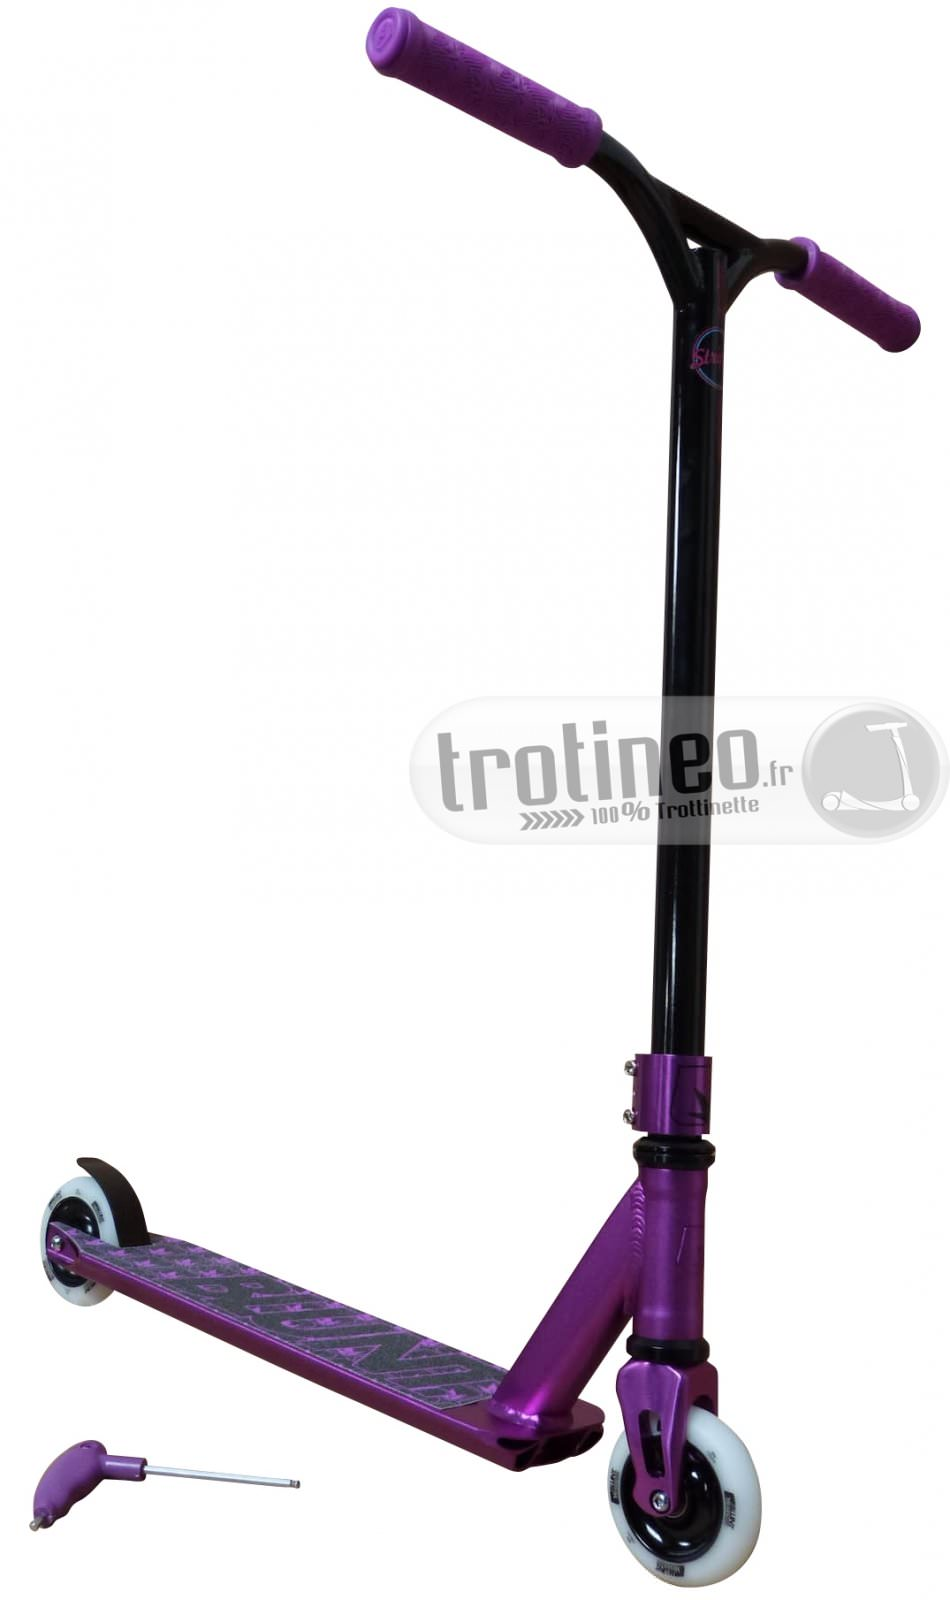 trotinette freestyle complete blunt violette trotineo. Black Bedroom Furniture Sets. Home Design Ideas